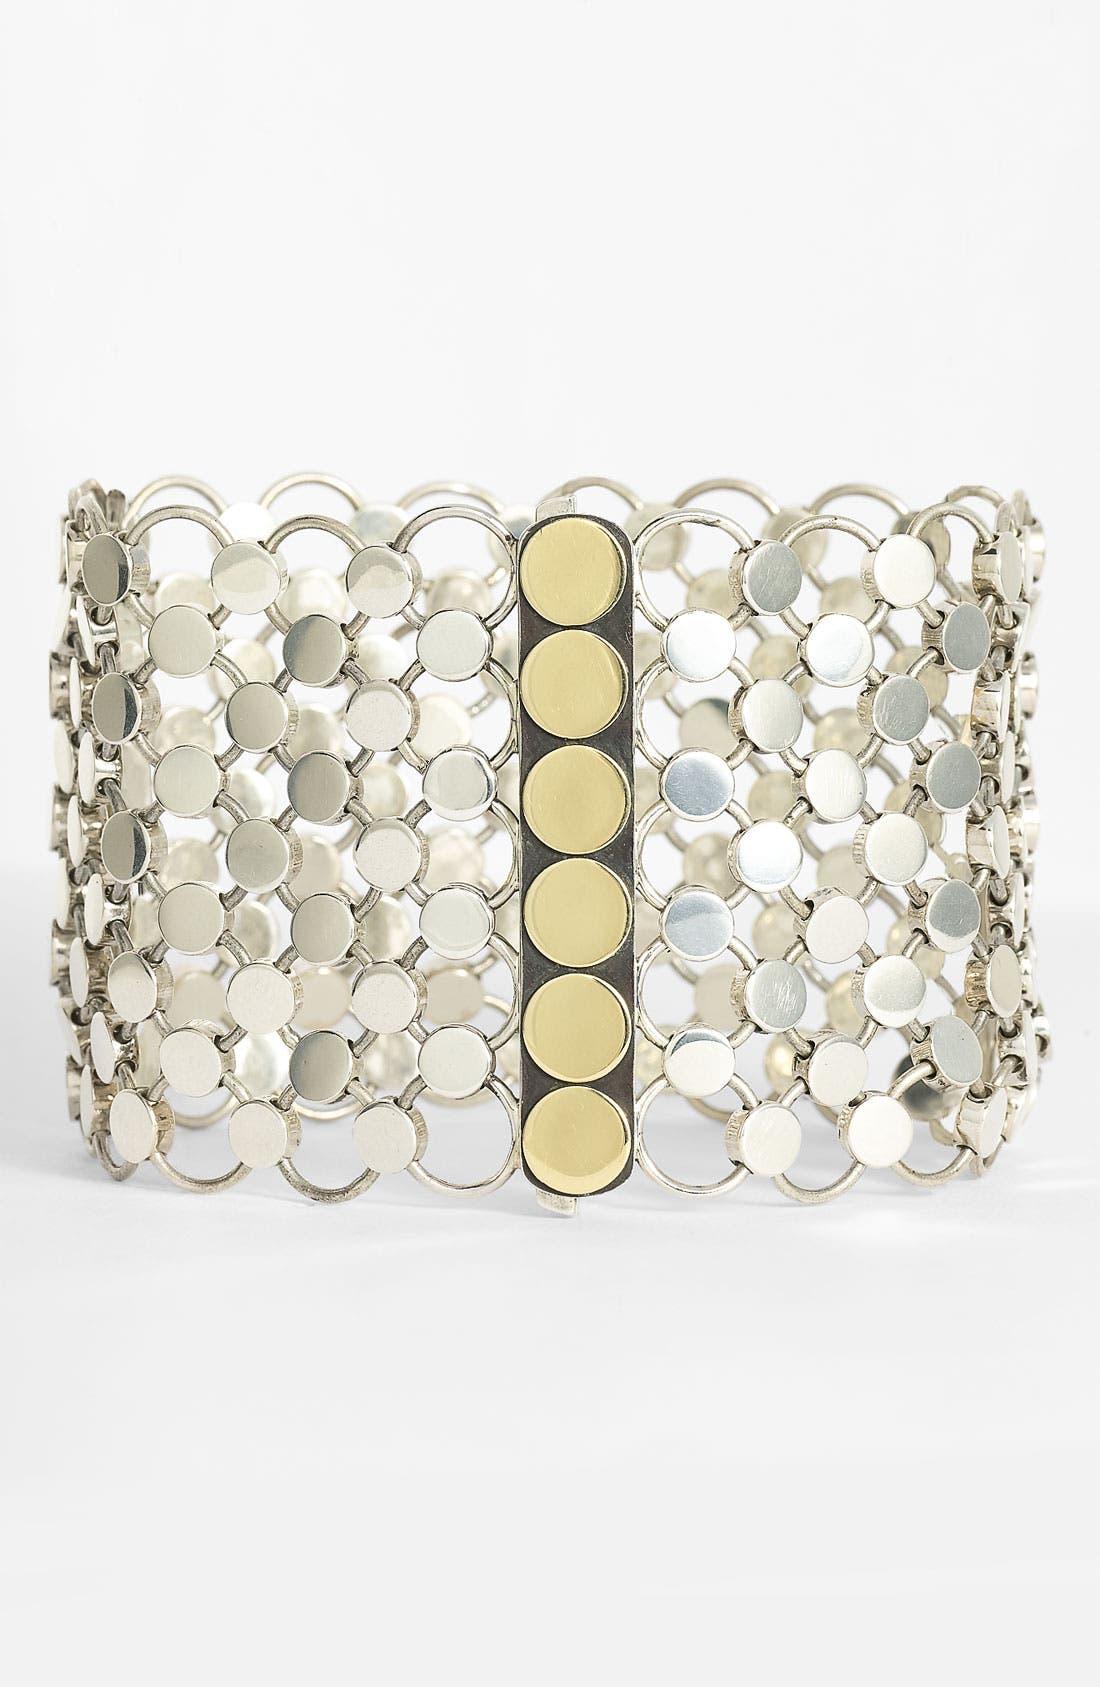 Alternate Image 1 Selected - John Hardy 'Dot' Wide Linked Bracelet